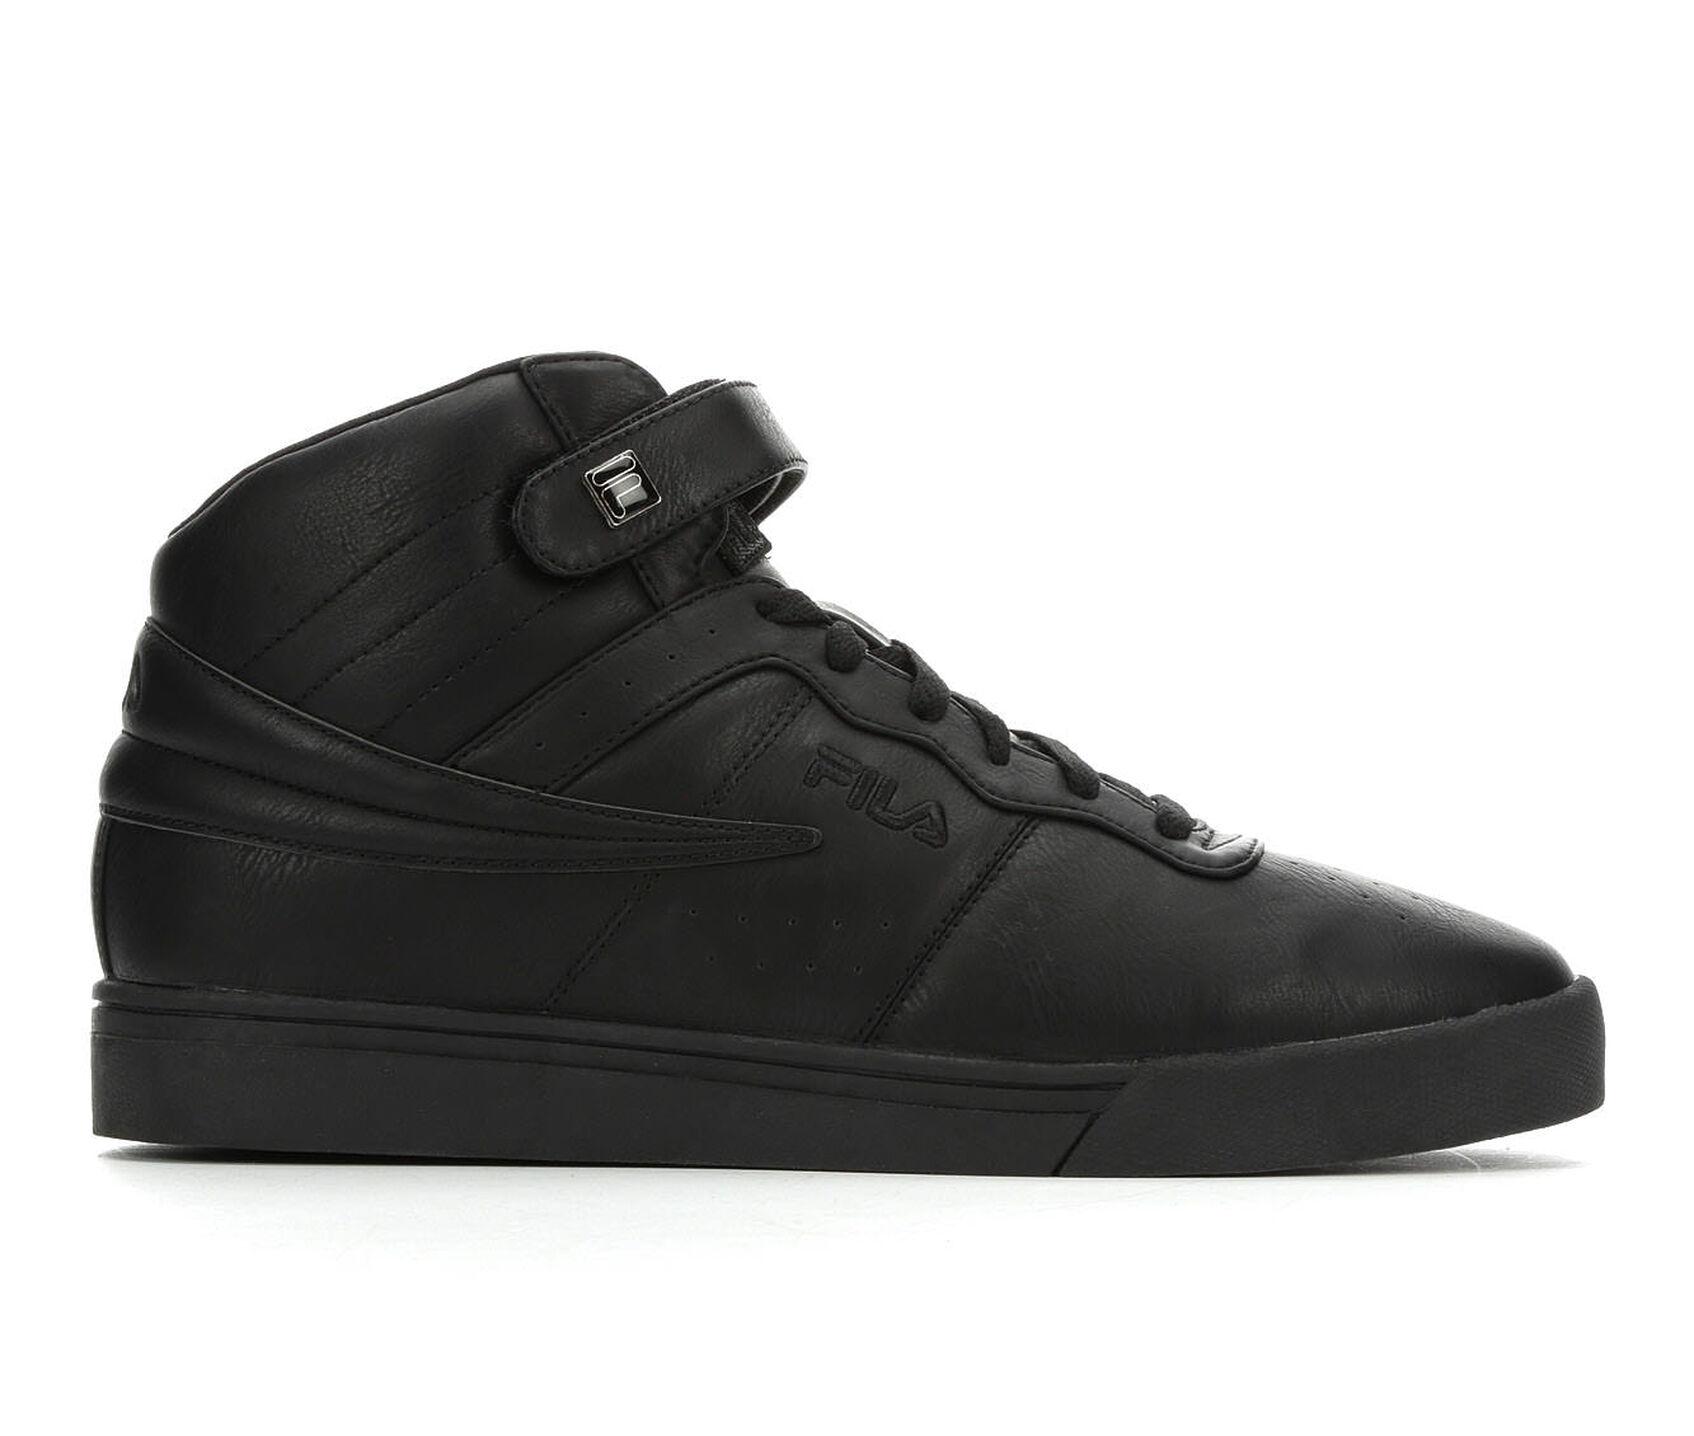 8b7f70a859bb Men s Fila Vulc 13 Distressed Retro Sneakers